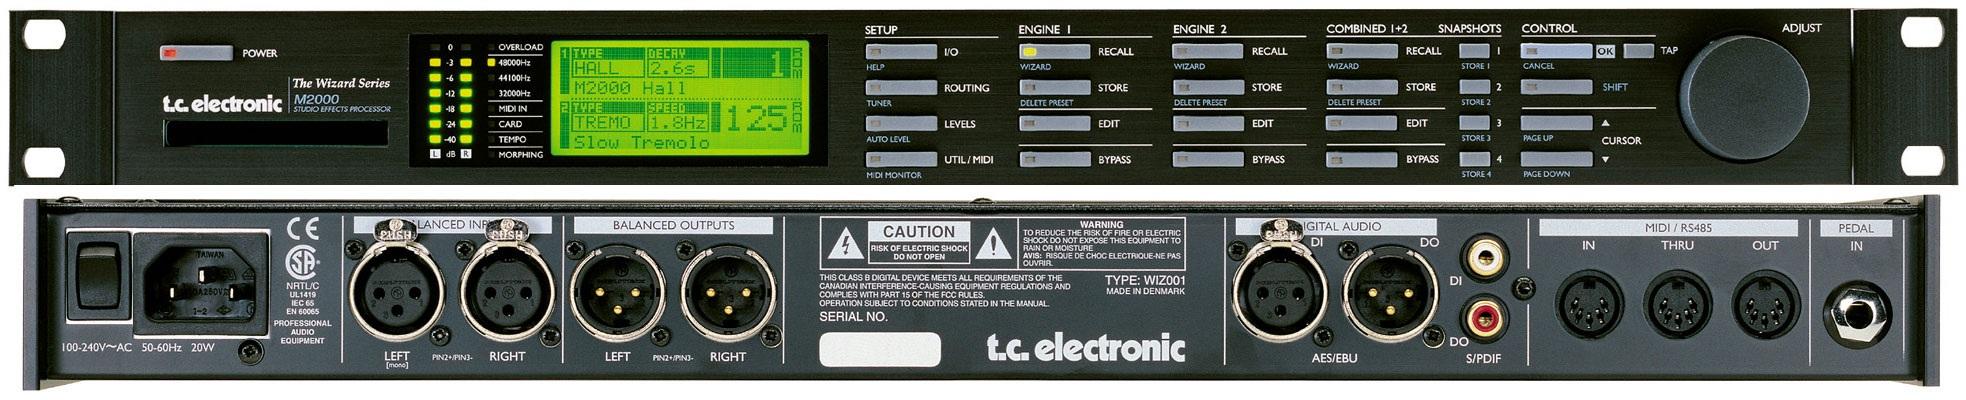 TC electronics M2000 Image